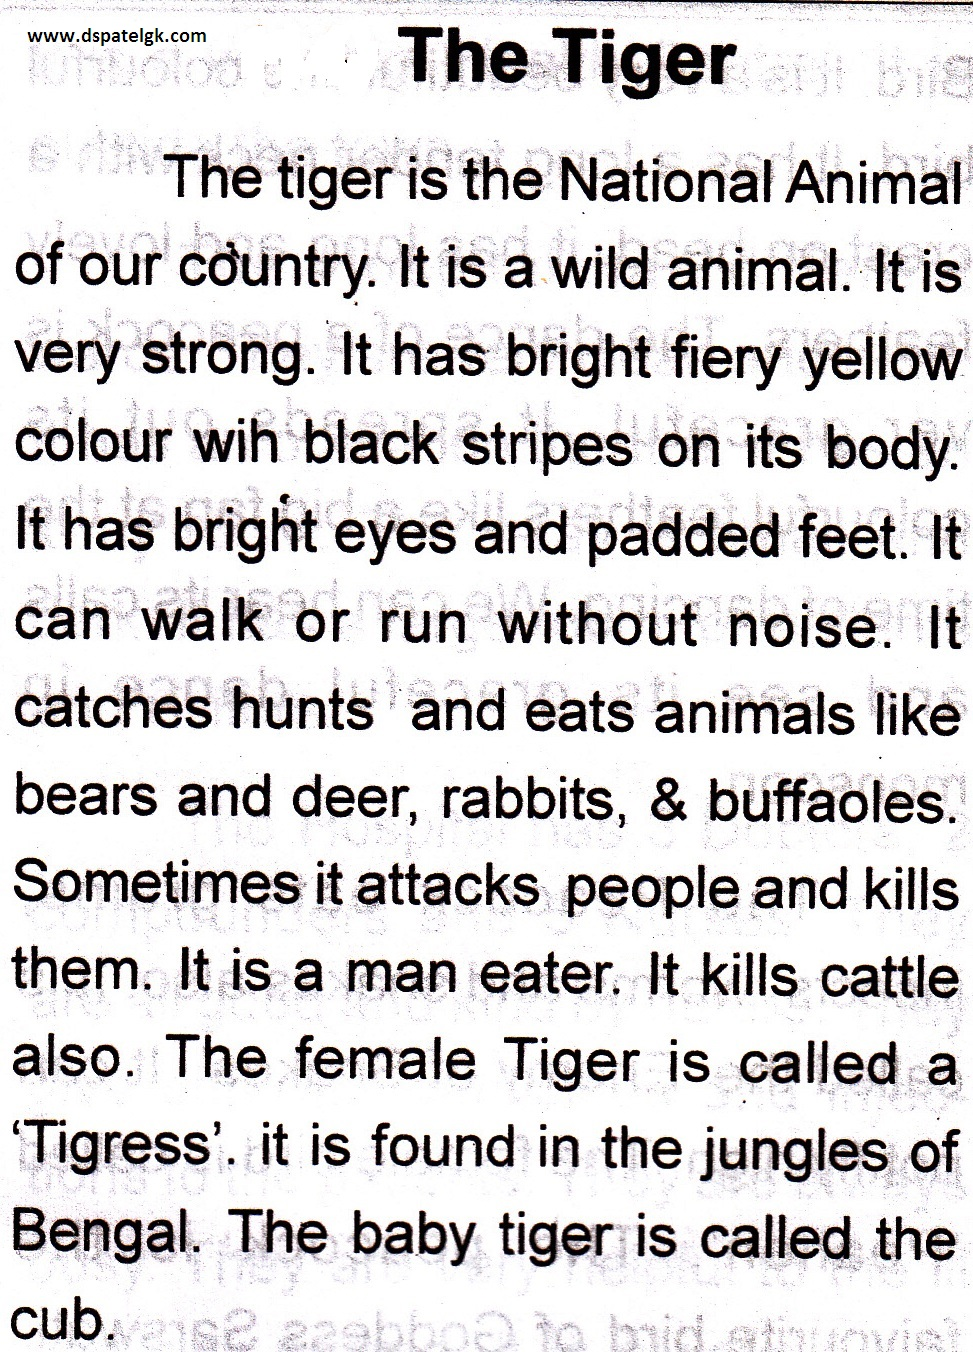 Tiger essay in gujarati